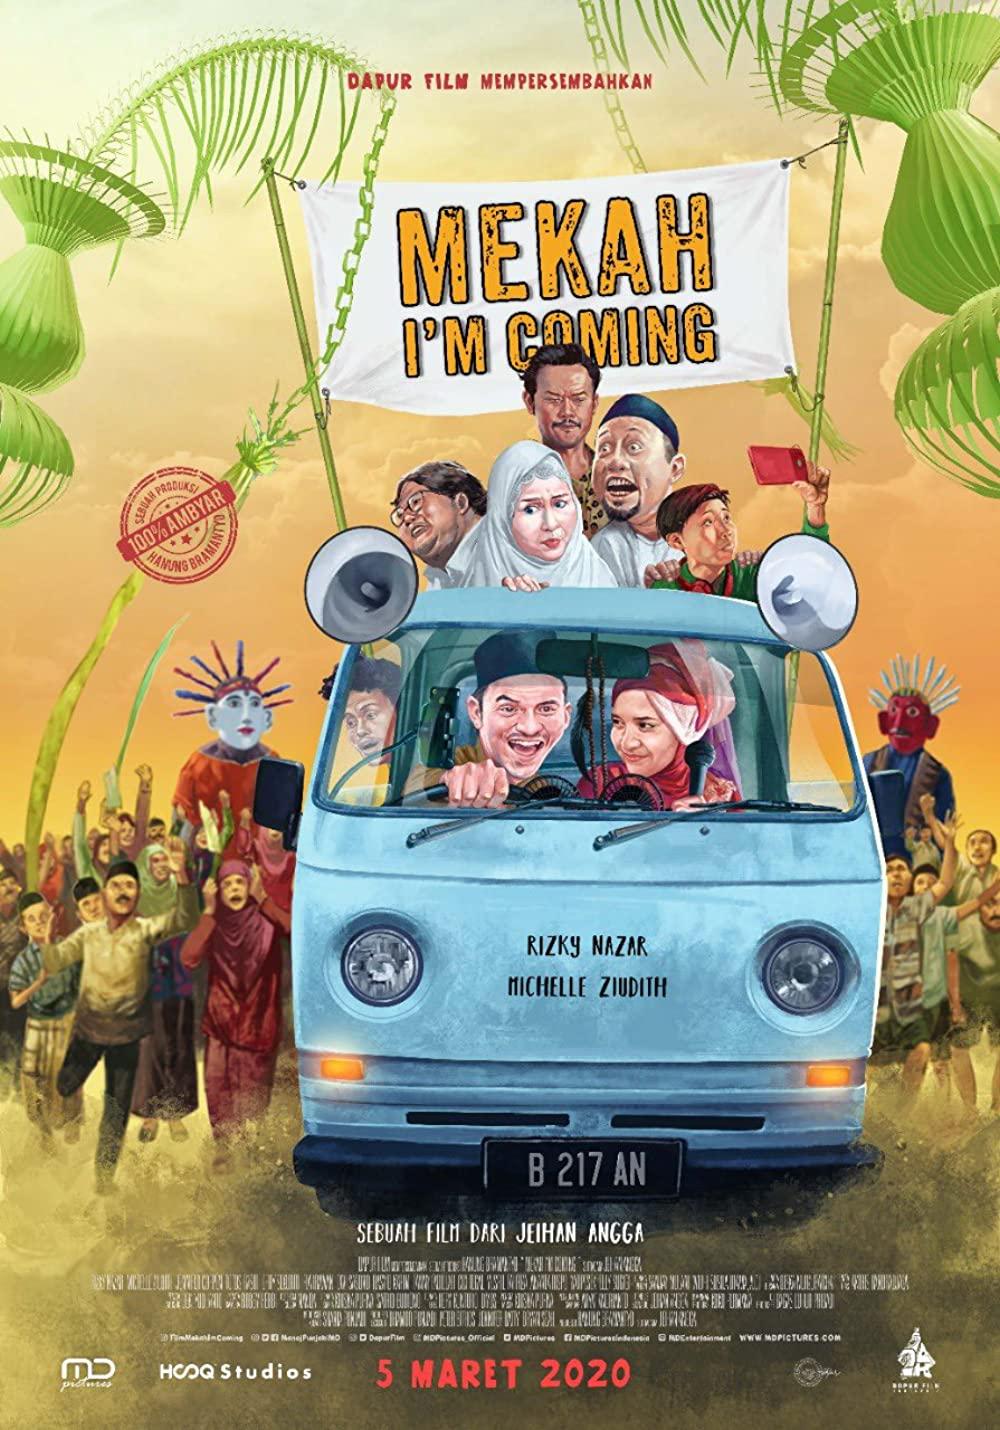 Mecca I'm Coming (2019) พิสูจน์รัก ณ เมกกะ